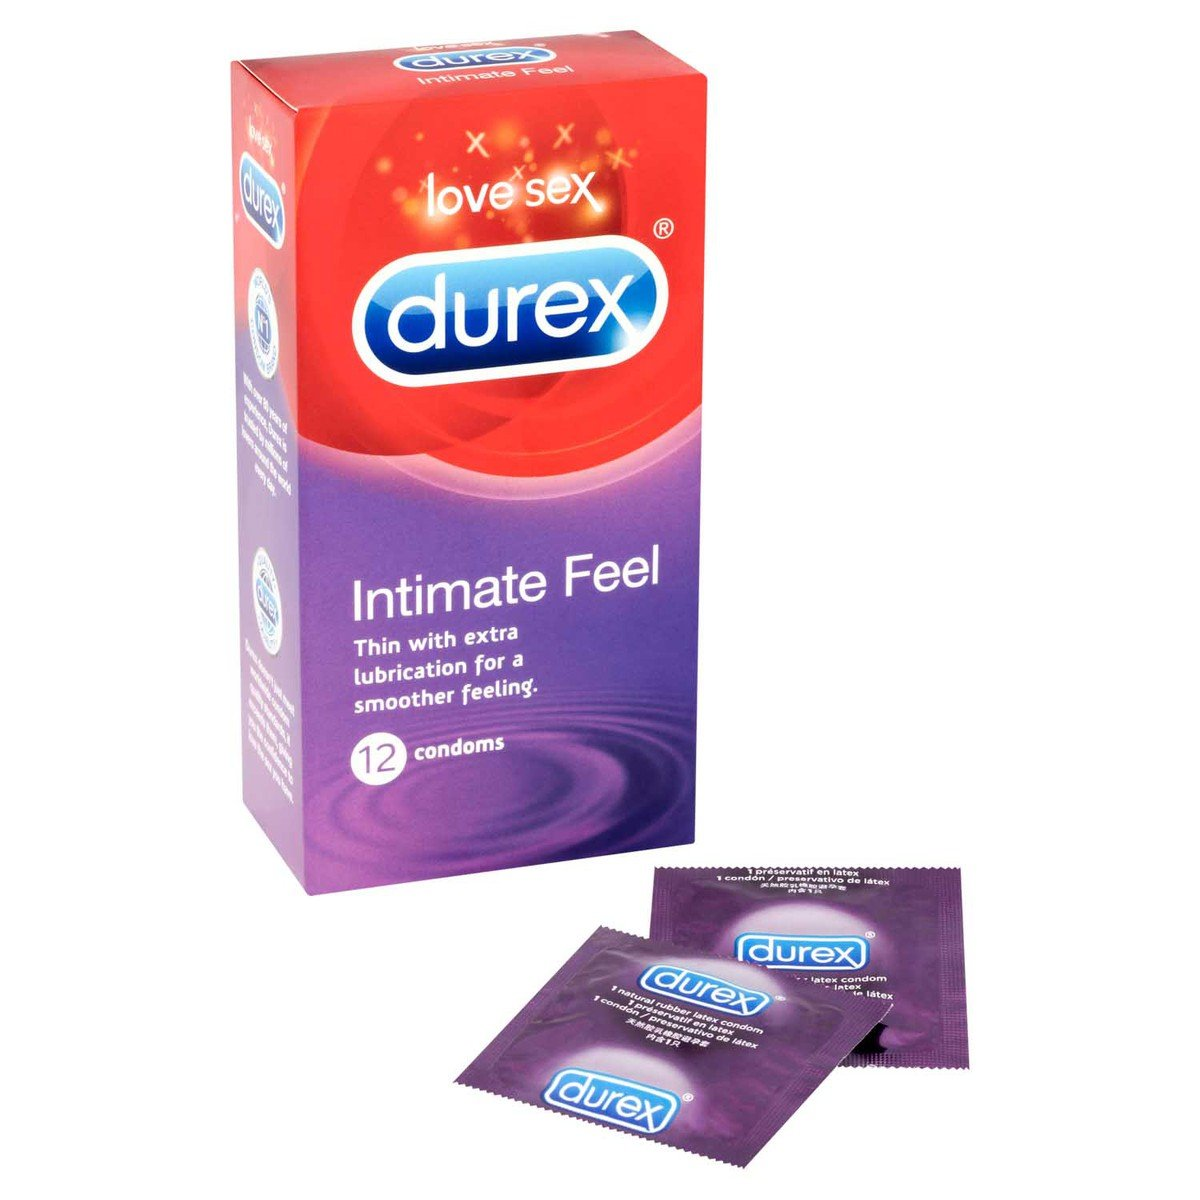 1 X Durex Extended Pleasure Performa Intimate Feel Elite Play Lube 100 Ml Free Kondom Ribbed Isi 3 Bot Of Tingle Gel Health Personal Care